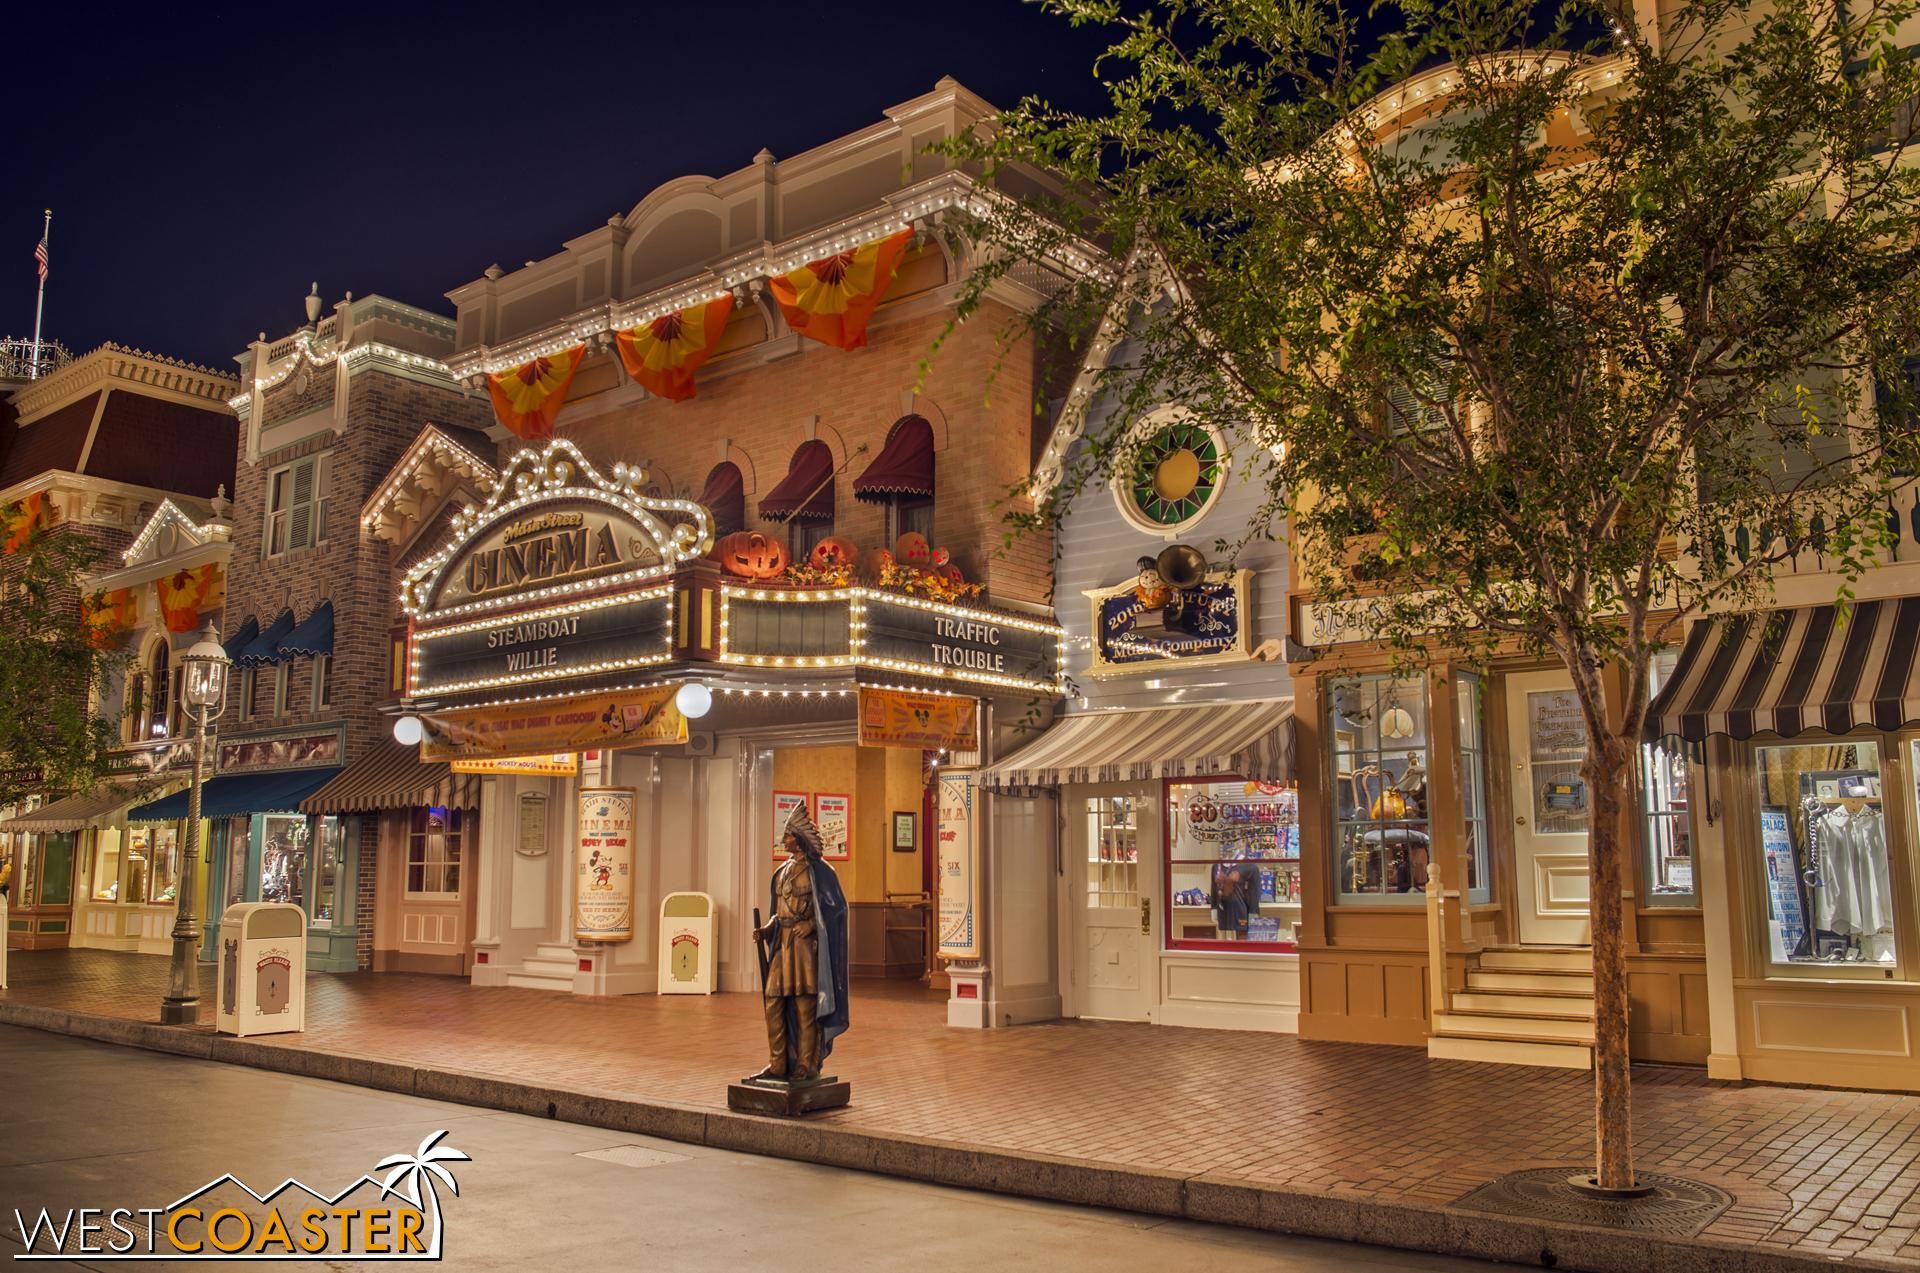 Onto the Main Street Cinema.